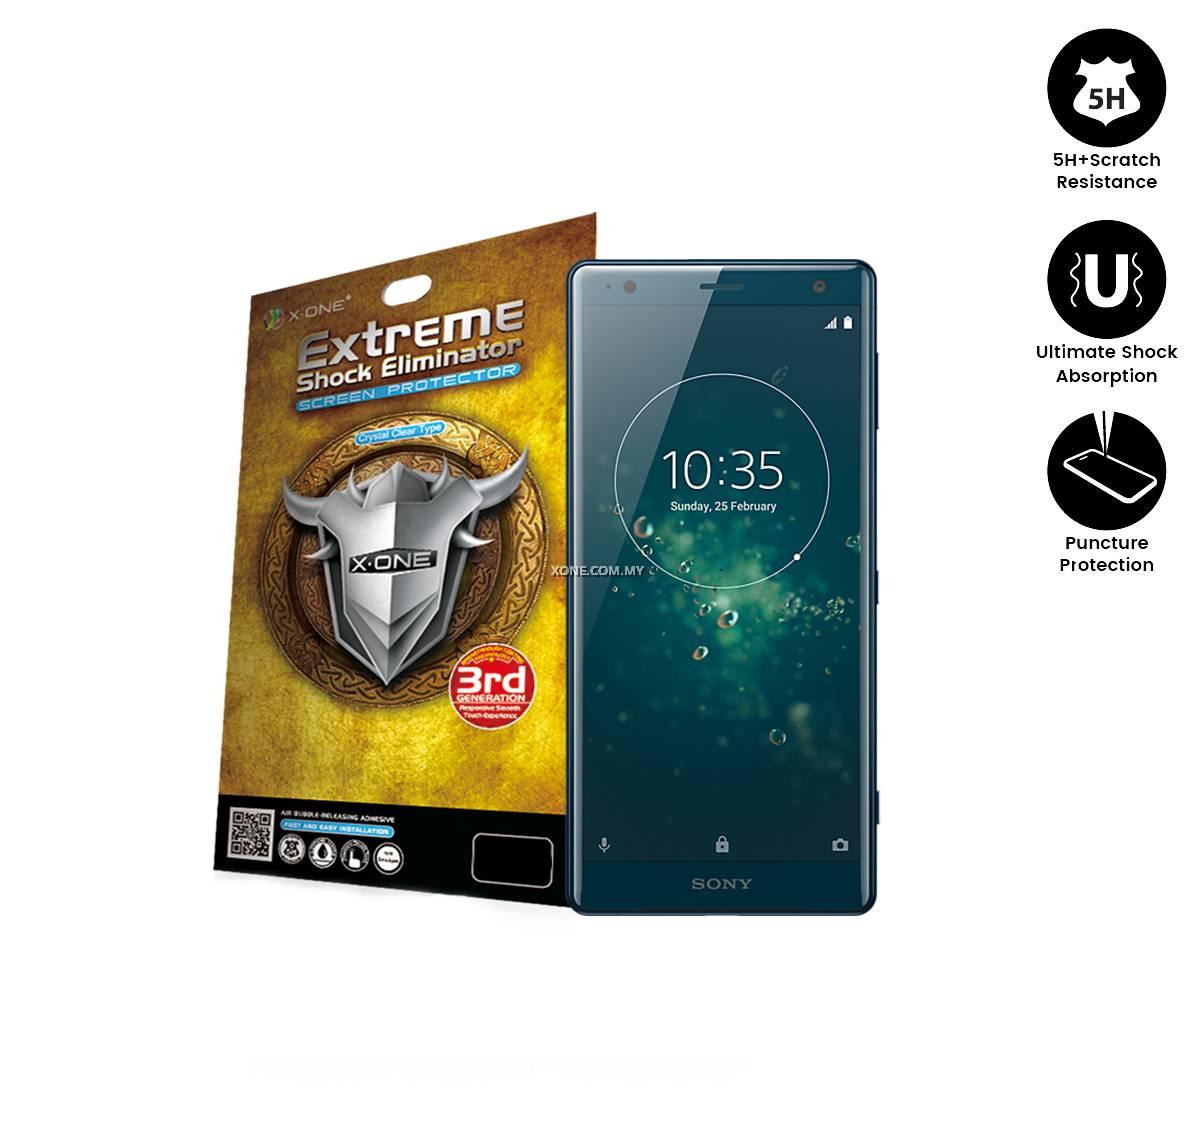 Sony Xperia XZ2 X-One Extreme Shock Eliminator Screen Protector